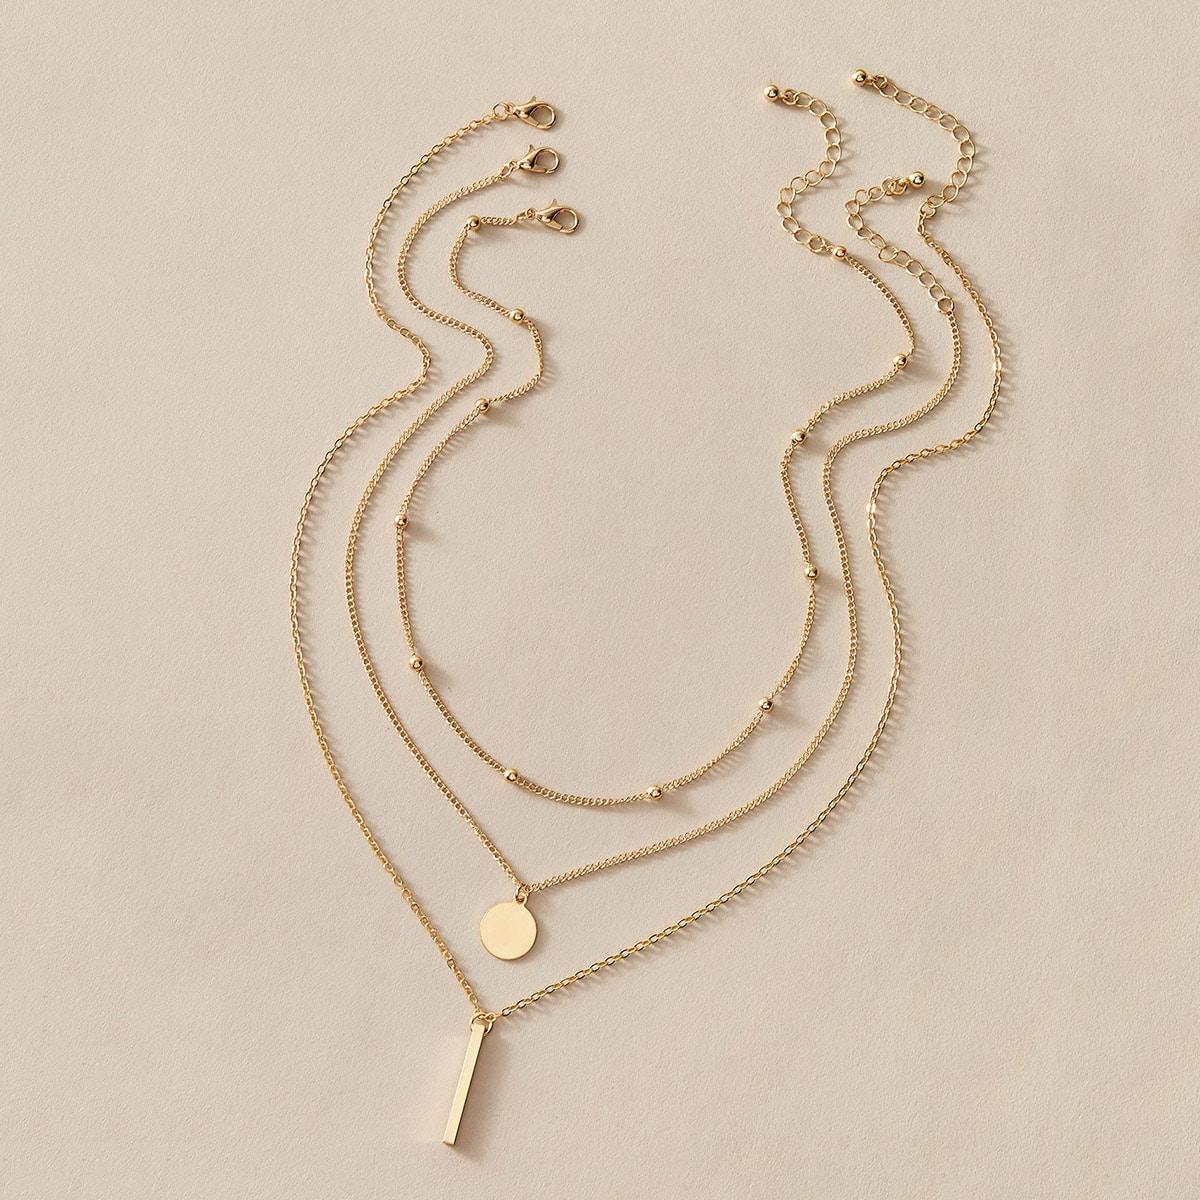 3 Stücke Bar & Disc Charm Halskette